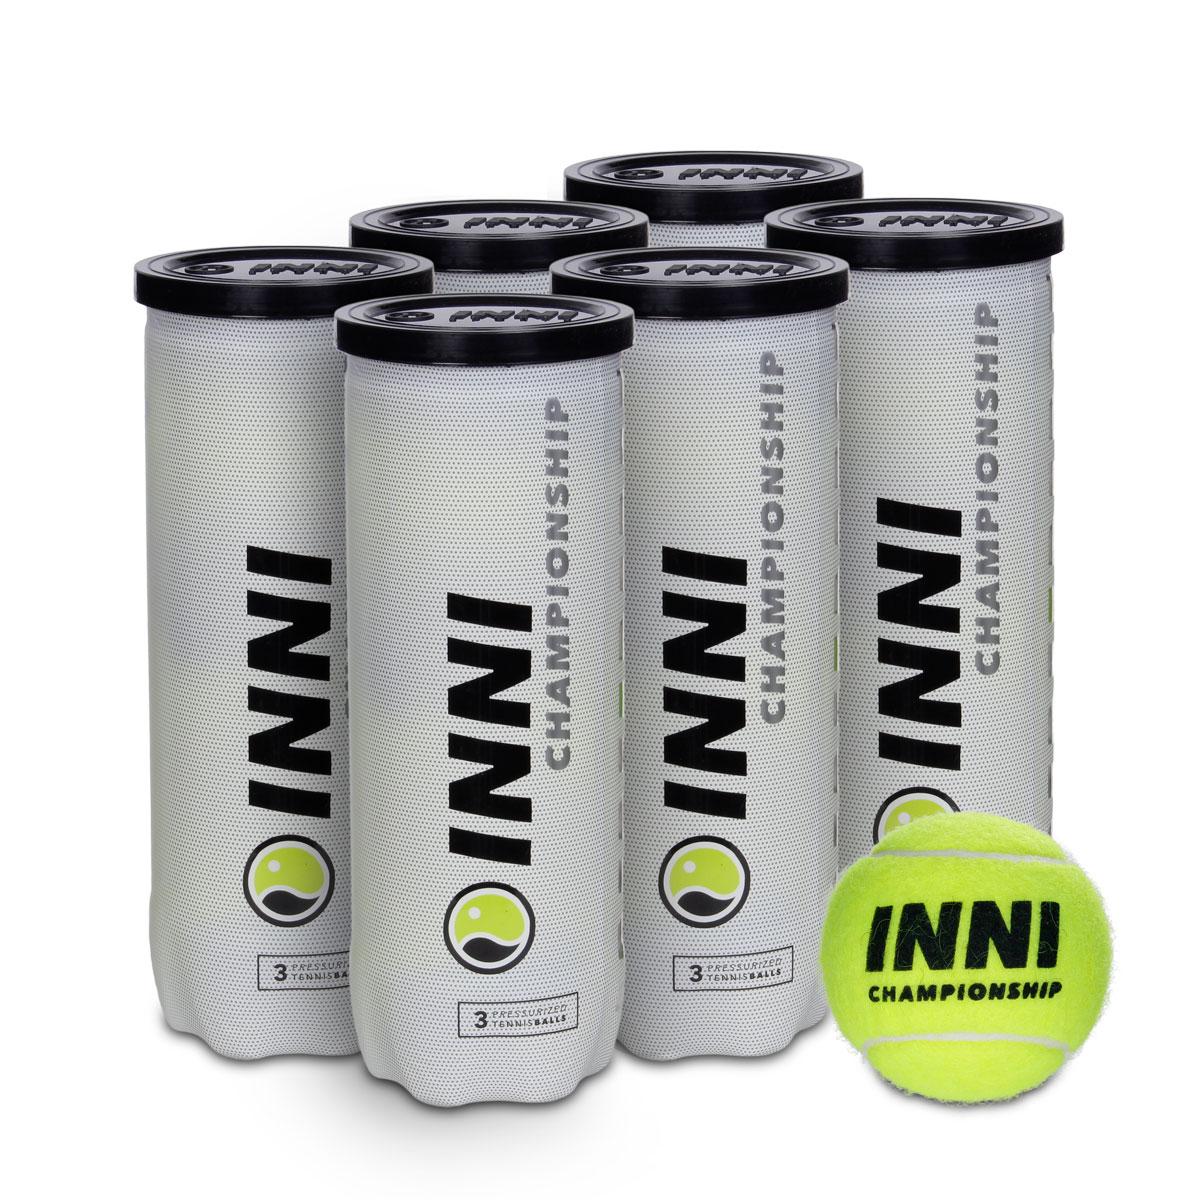 Bola de Tênis Inni Championship - Pack com 6 Tubos  - PROTENISTA